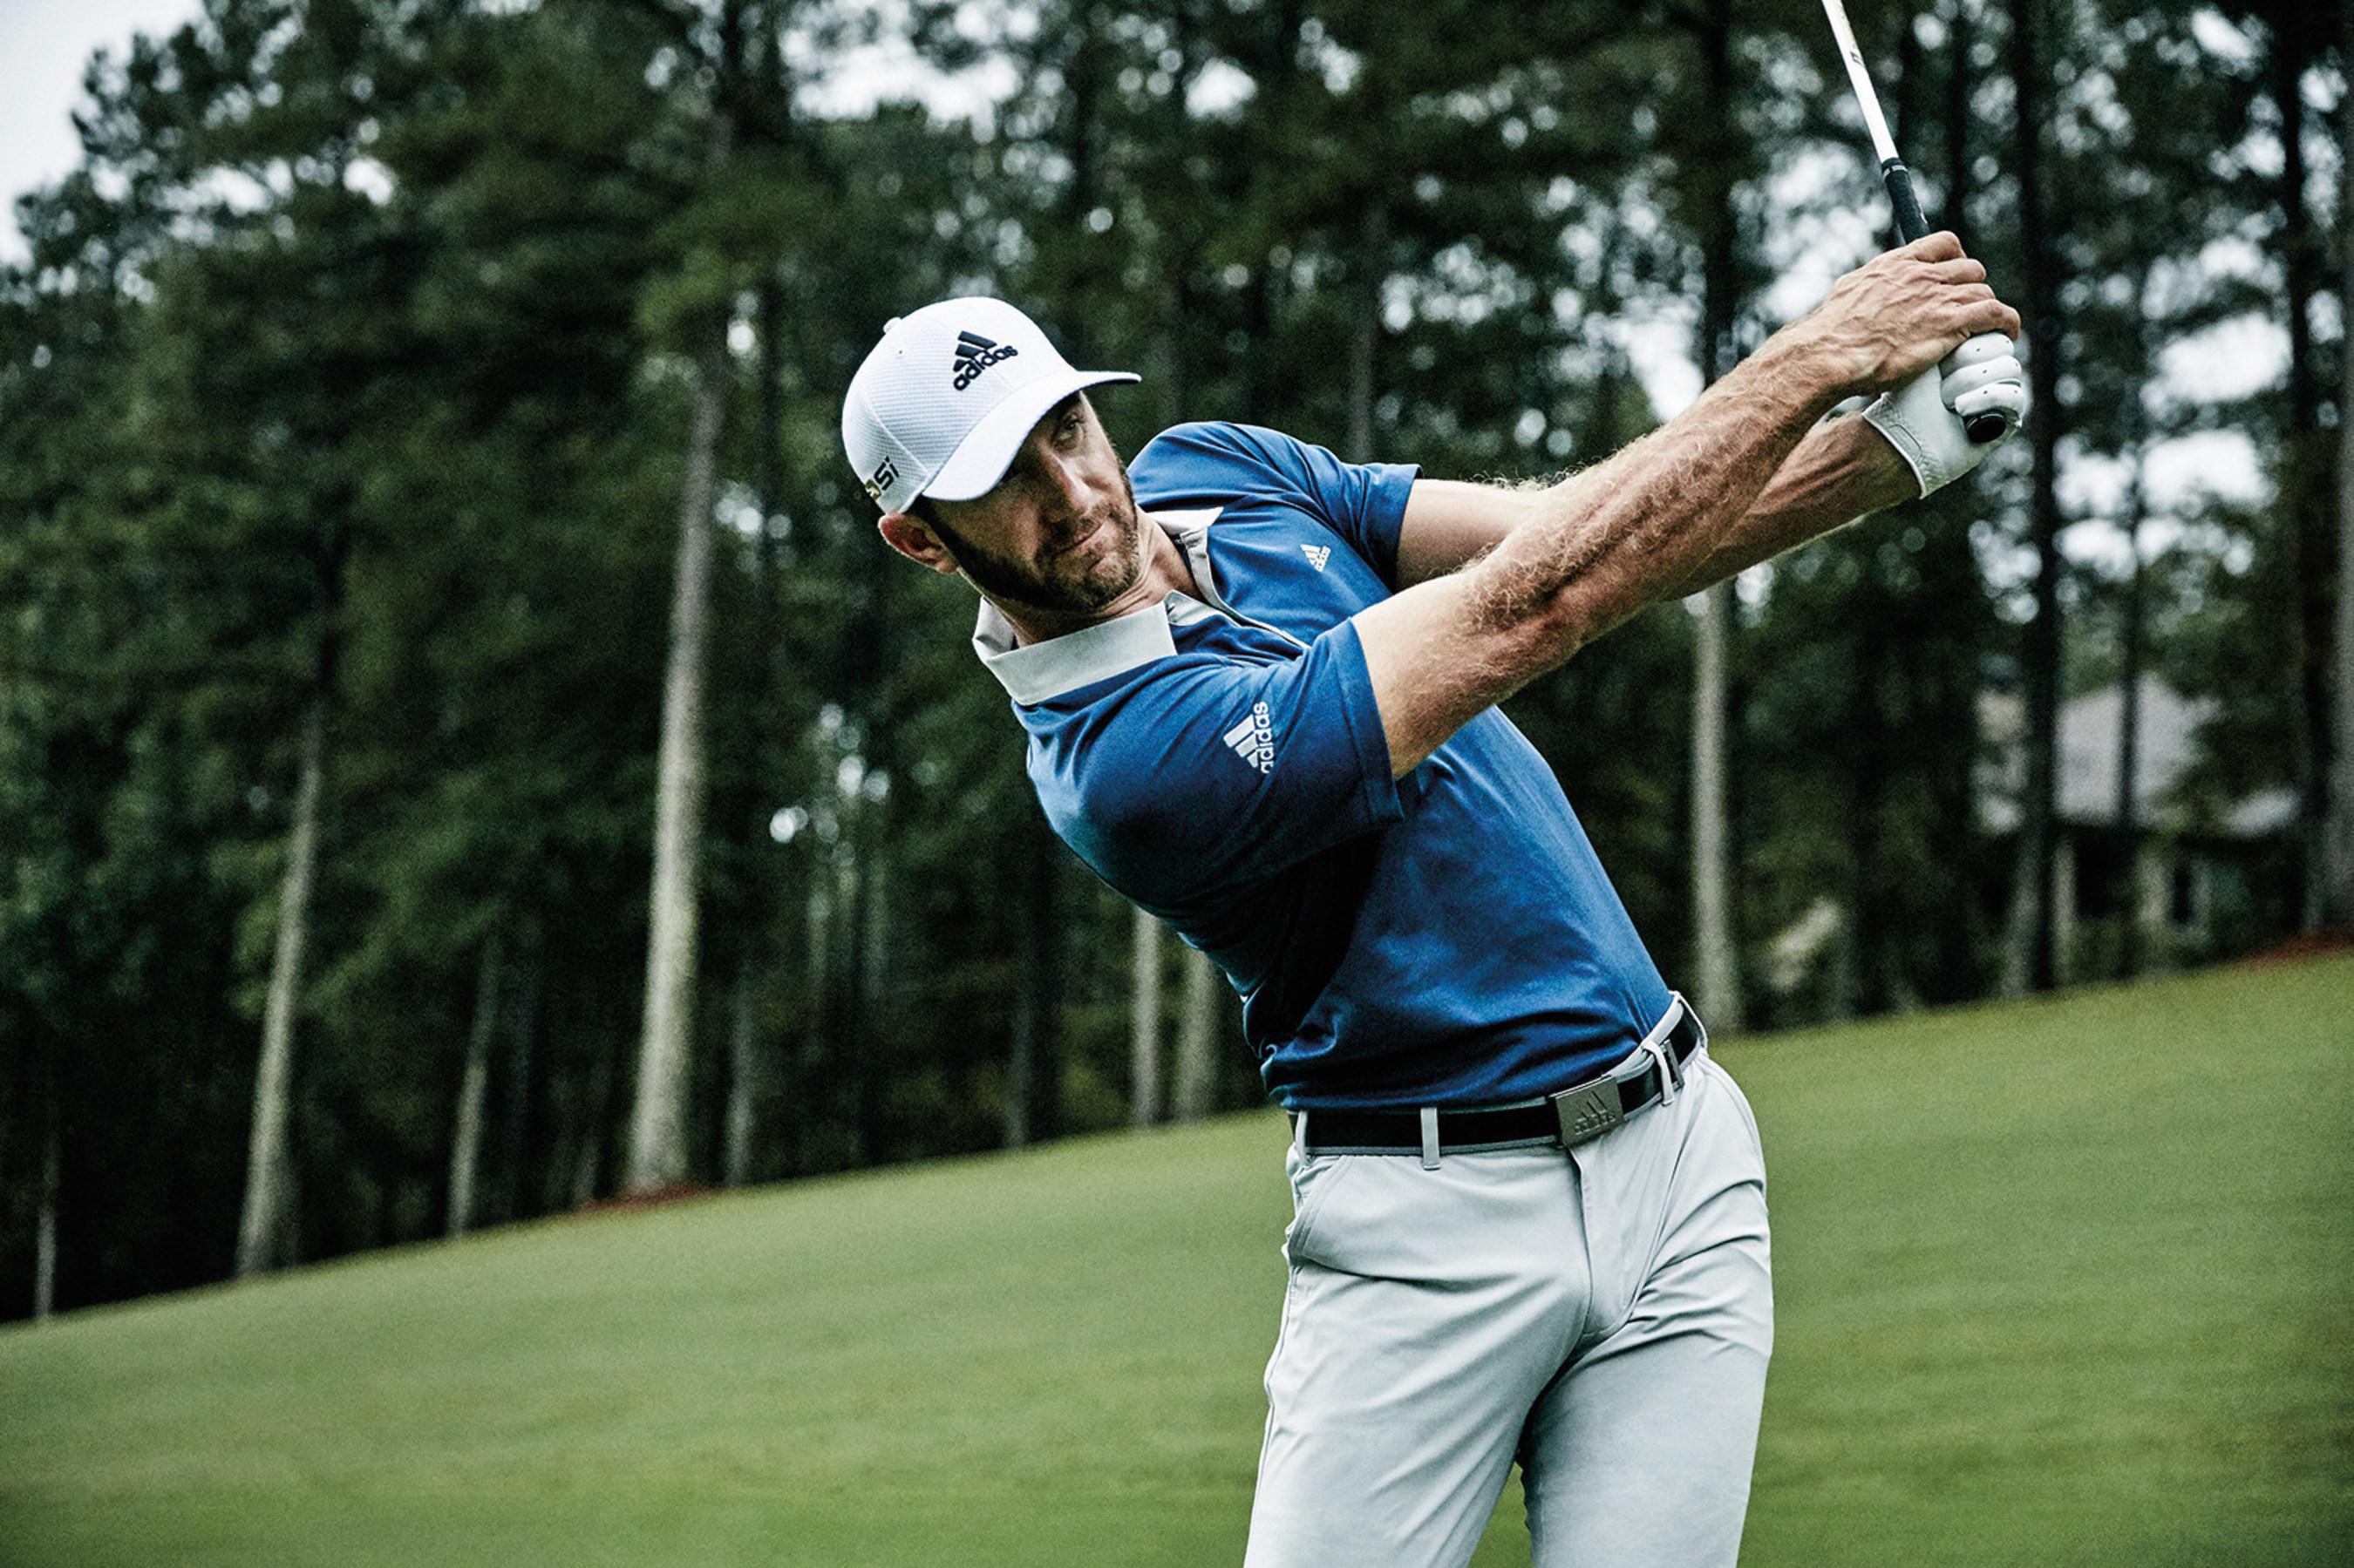 Descenso repentino Alboroto No autorizado  adidas Golf and Dustin Johnson Agree to New Long-Term Deal